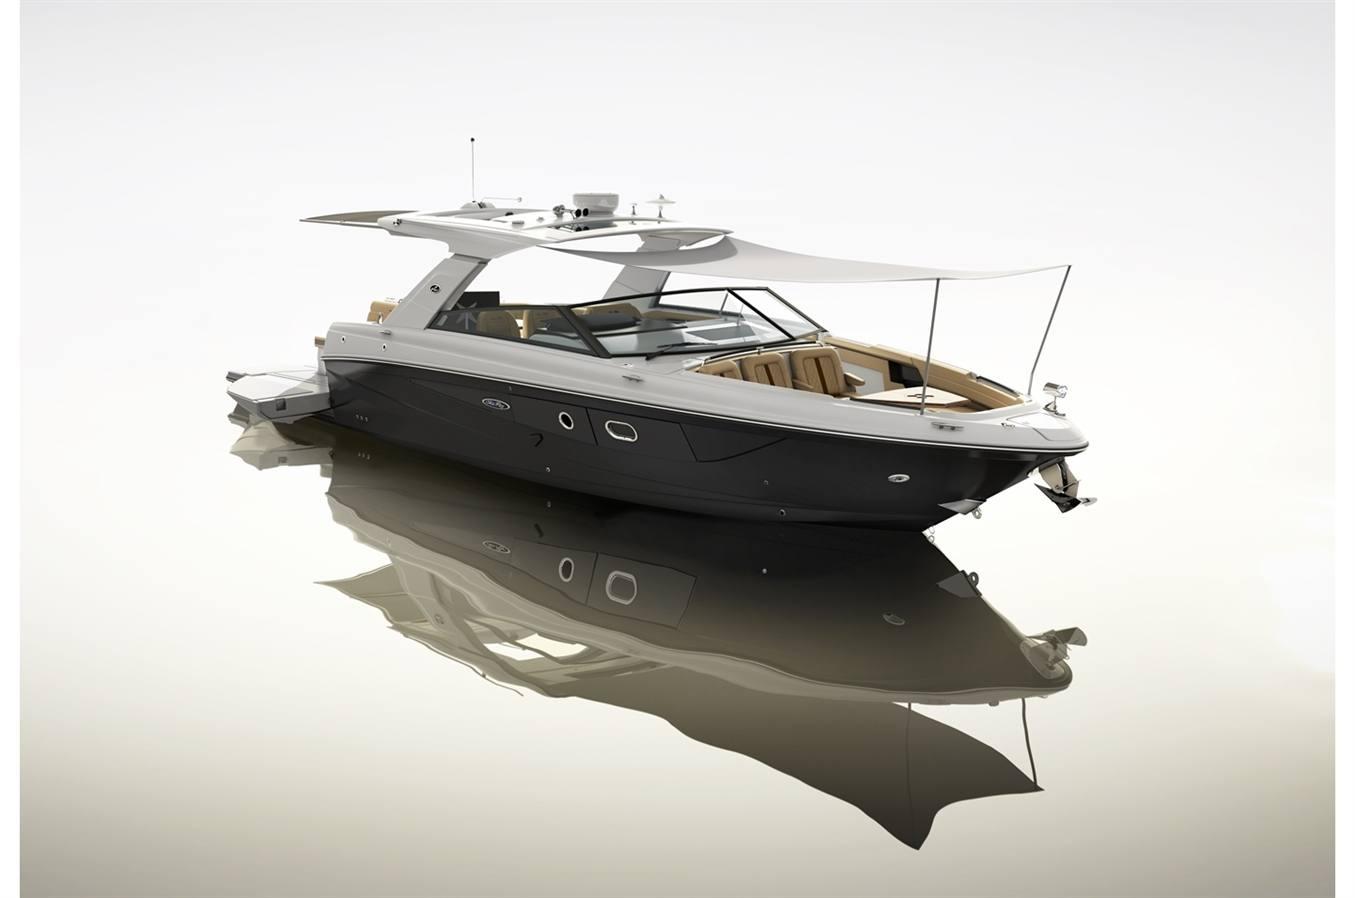 2018 Sea Ray SLX 400 for sale in Cincinnati, OH  Sea Ray of Cincinnati